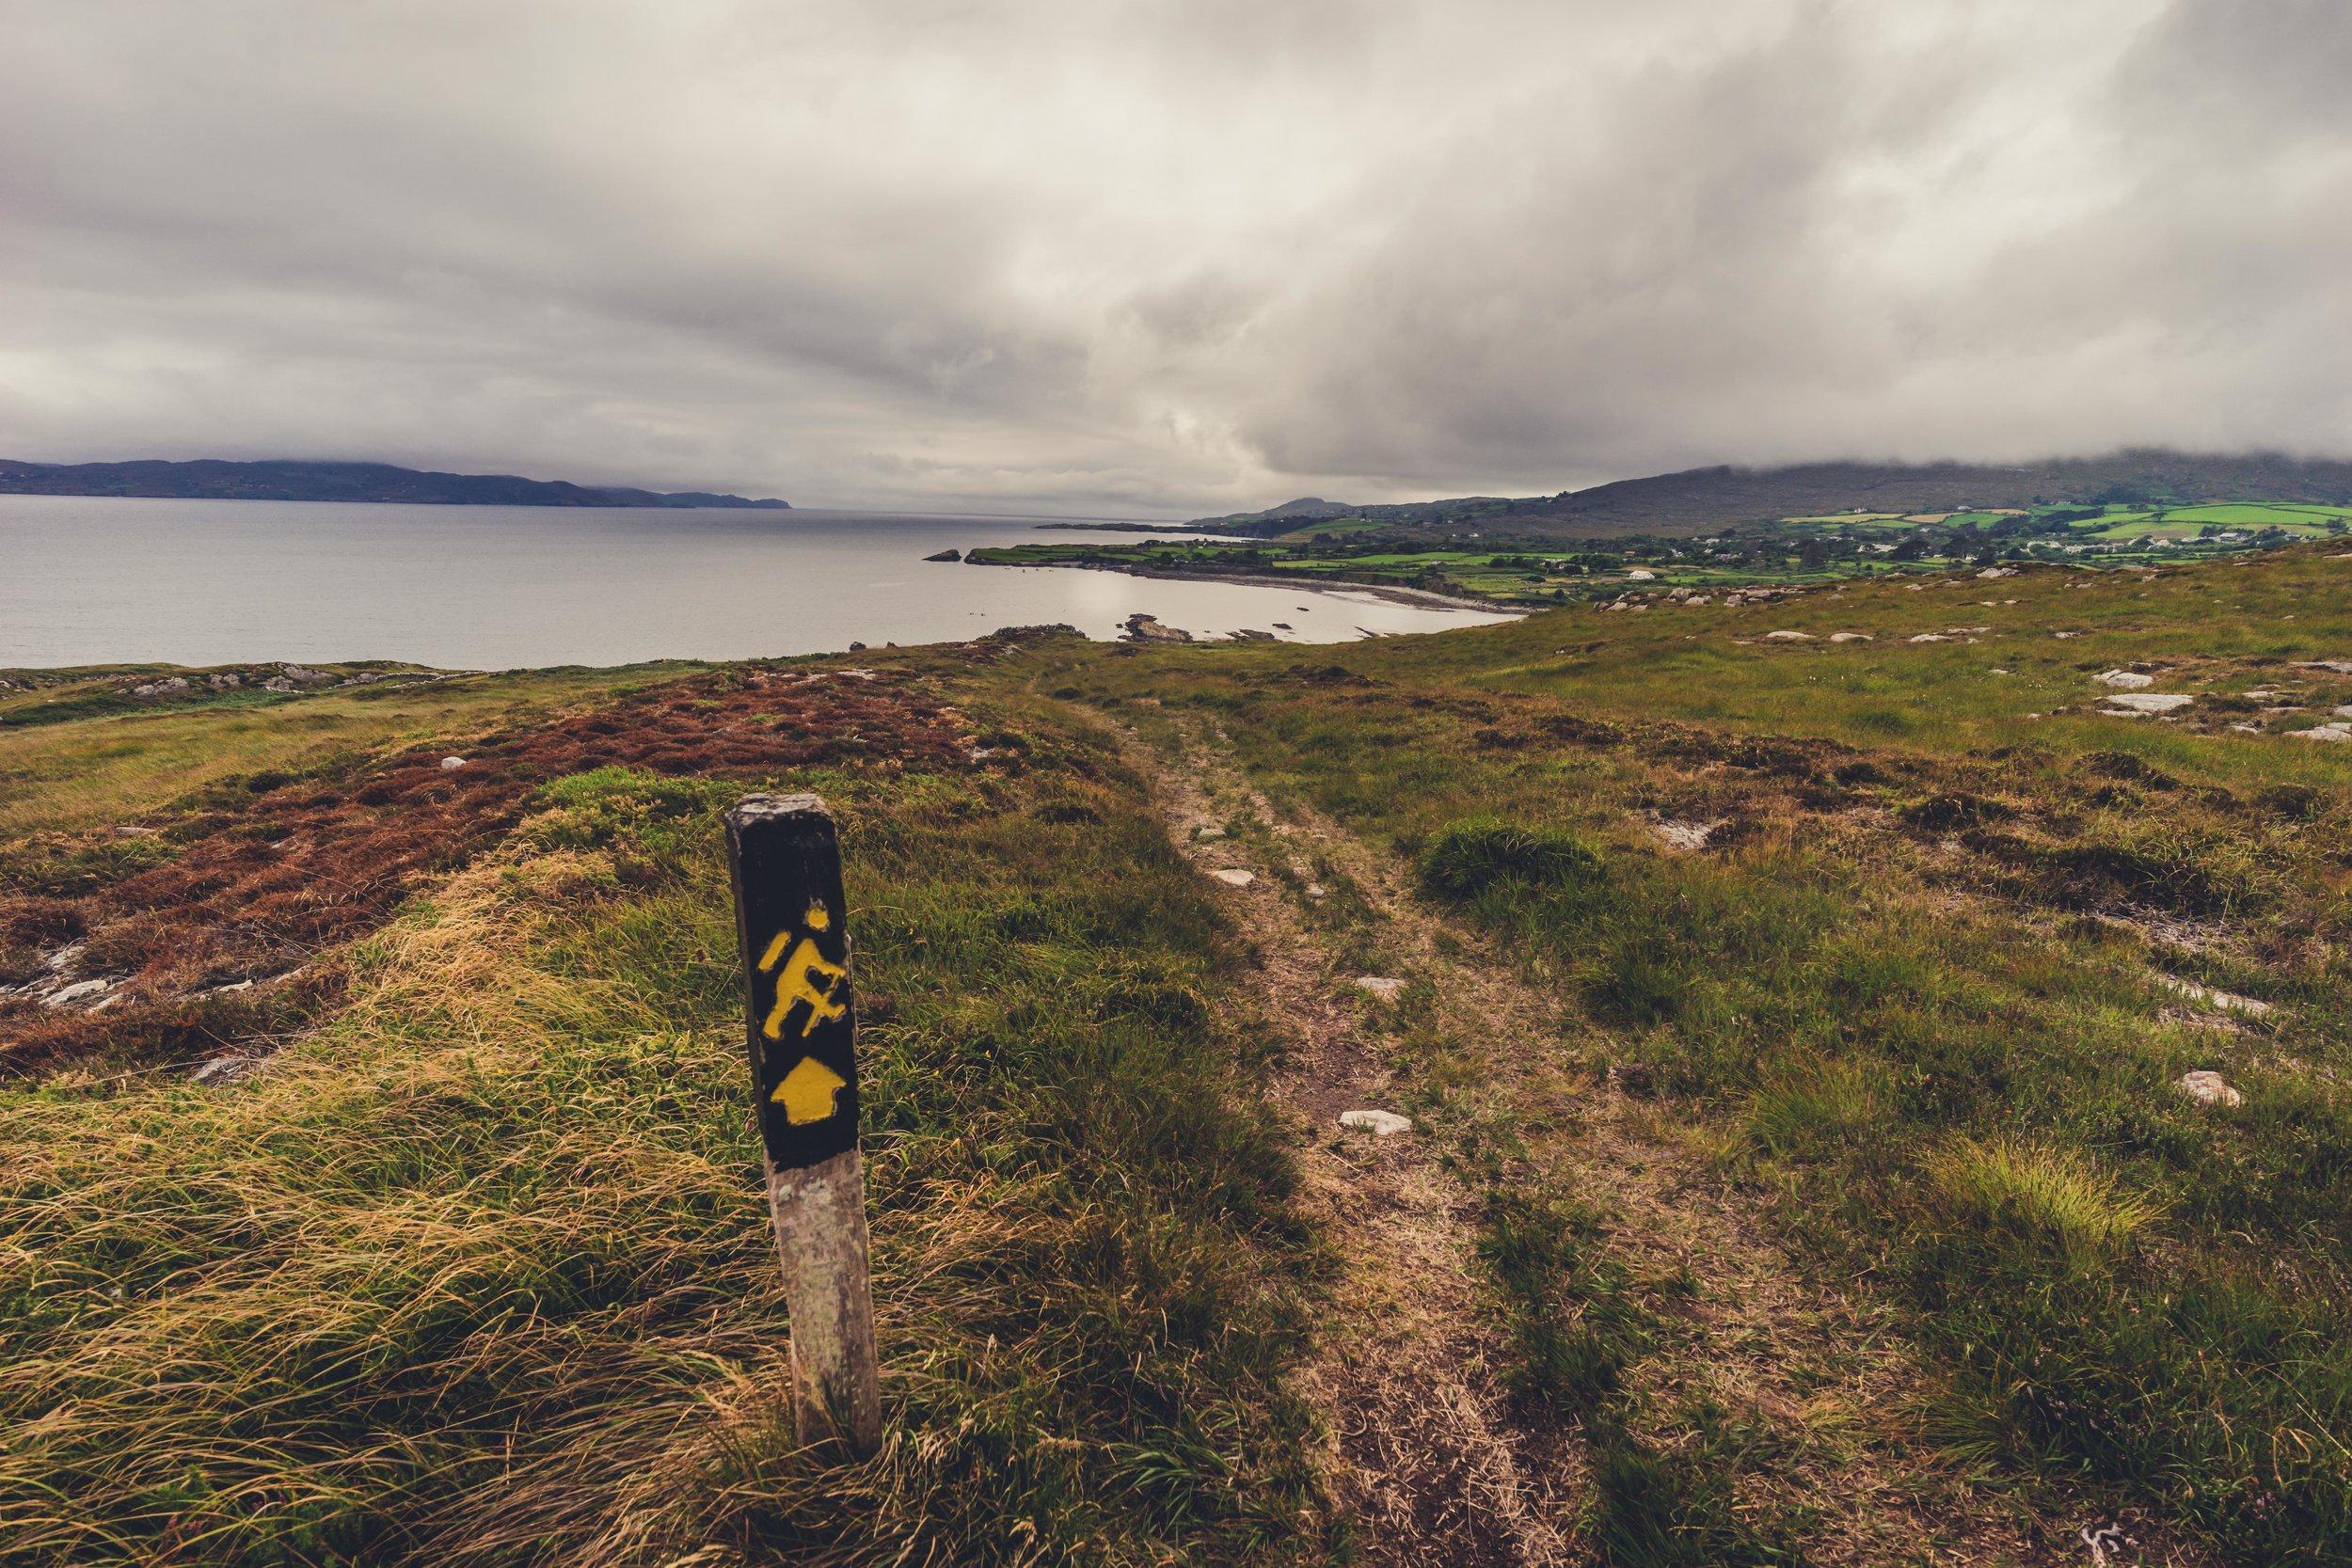 county cork. cork. ireland. irish. history. city. house sitting. old. travel. travel photography. travel photographer. lough hyne. hiking. outdoor. adventure. hiking. camping. hikuing trail.jpg